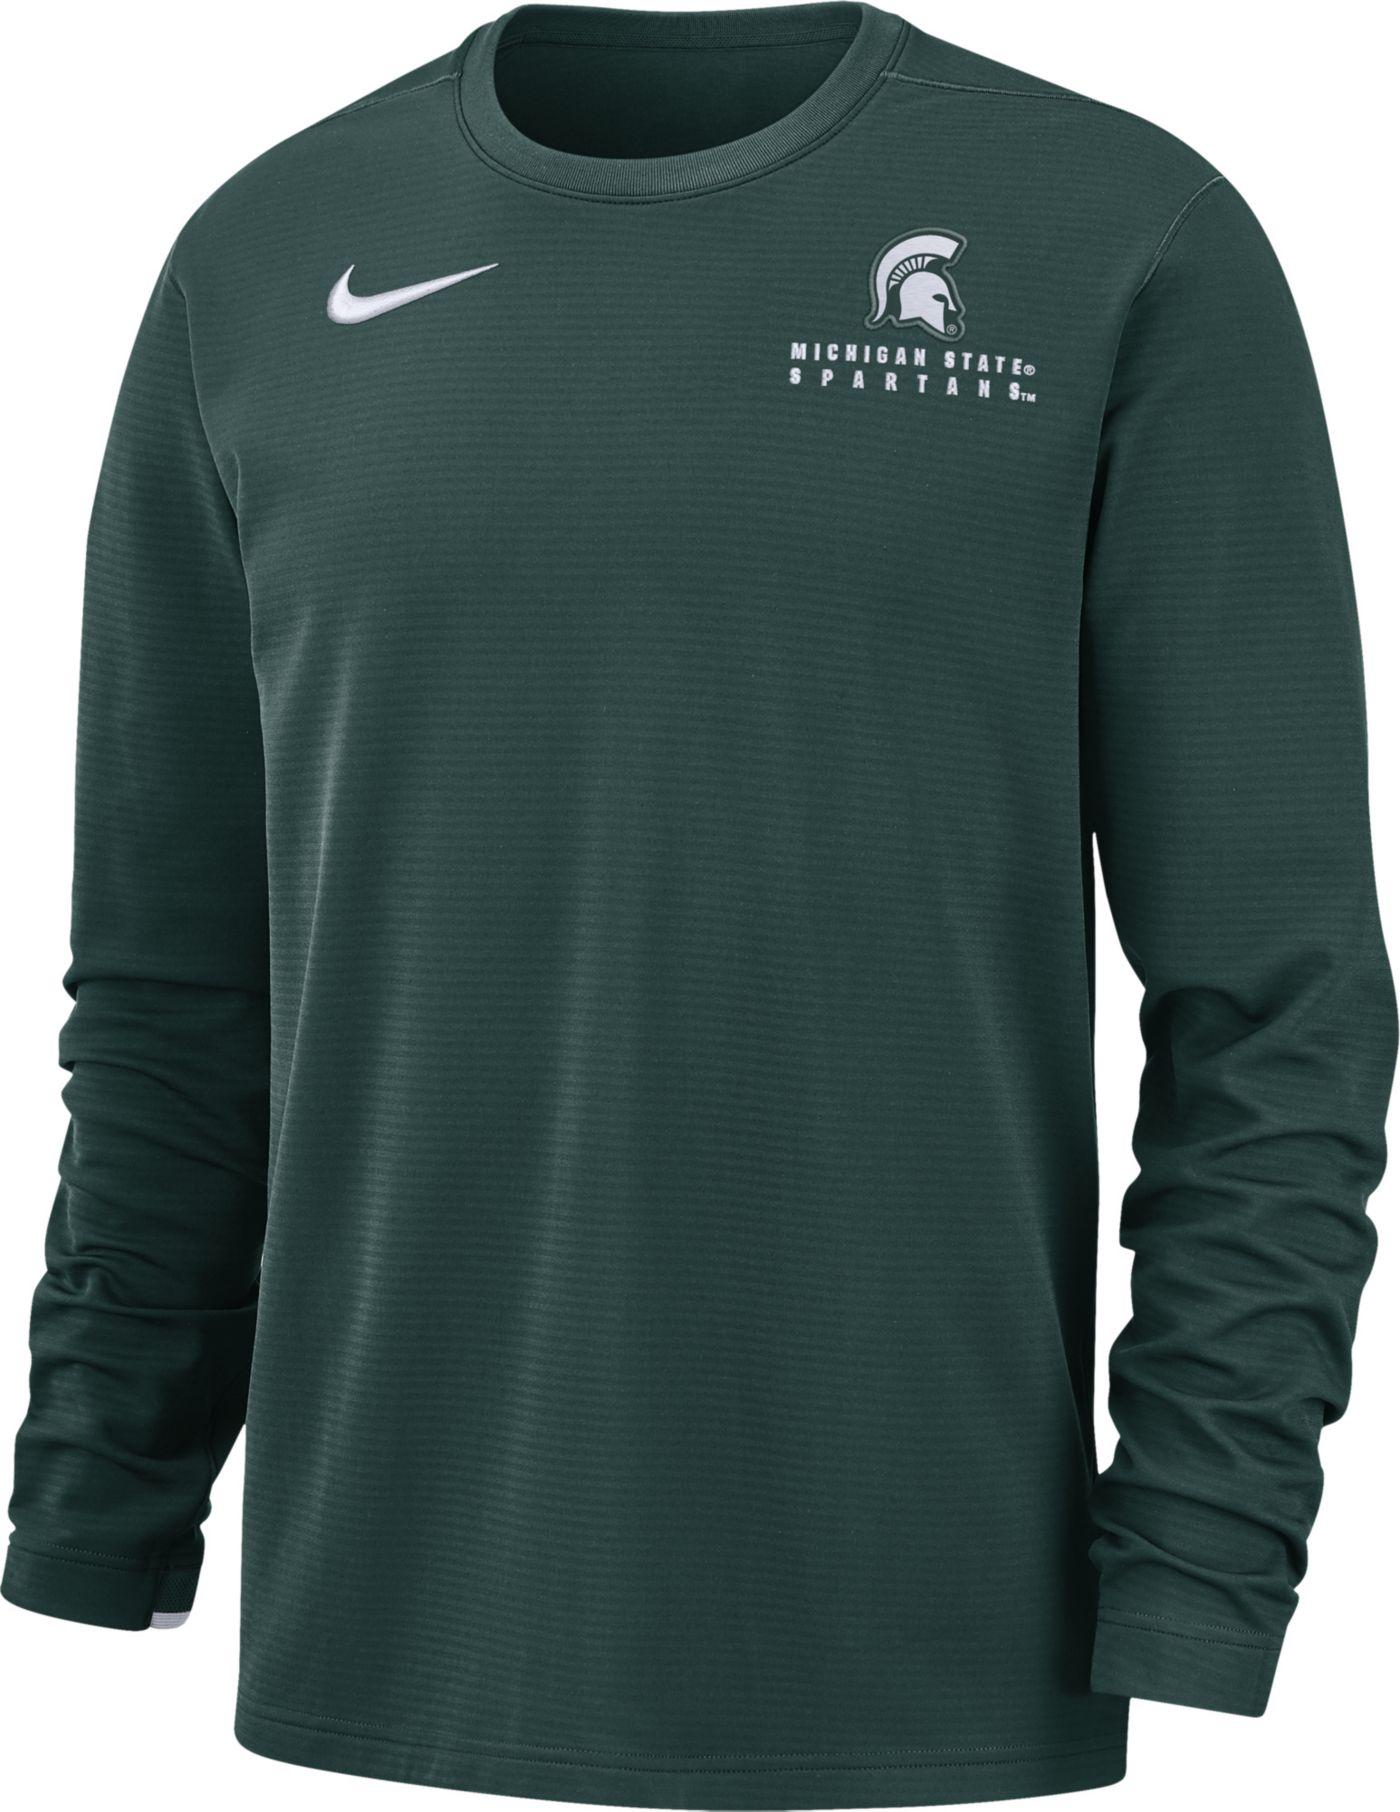 Nike Men's Michigan State Spartans Green Dri-FIT Modern Long Sleeve Crew Neck T-Shirt